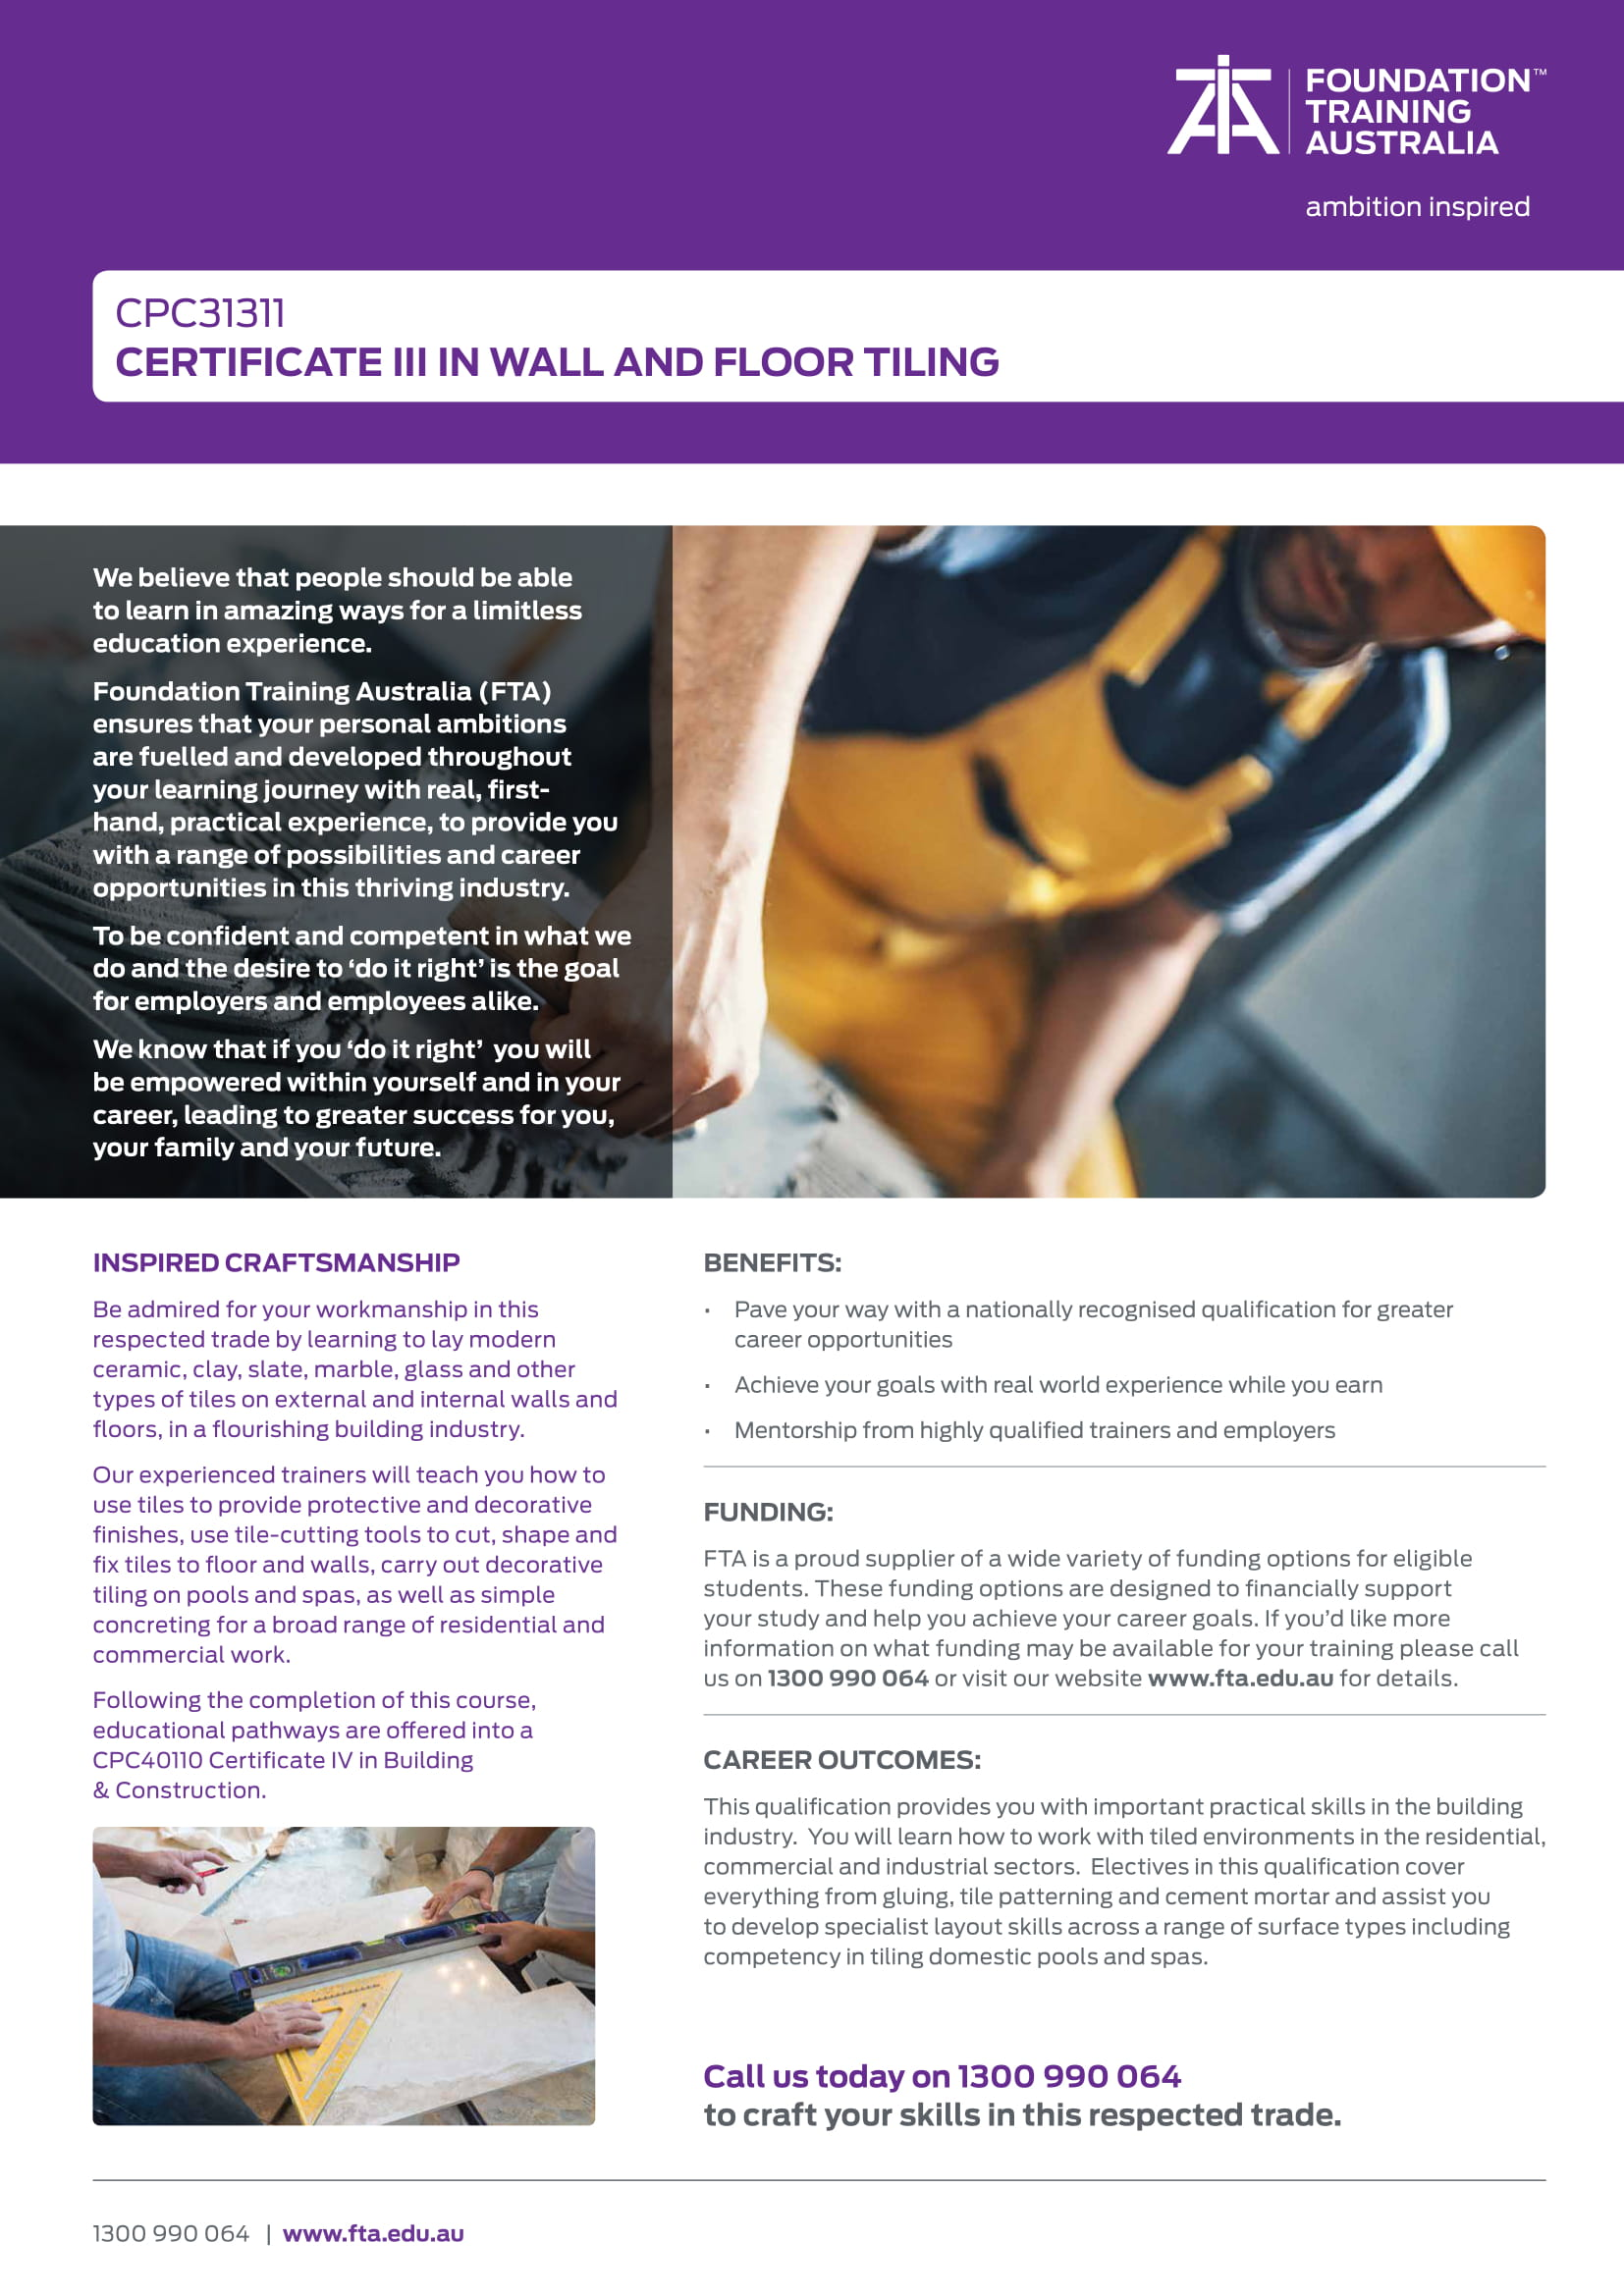 https://www.fta.edu.au/wp-content/uploads/2020/06/TP1.MK_.004-Wall-Floor-Tiling-Course-Flyer-CPC31311-V3-_-June-18-DIGITAL-1-1.jpg